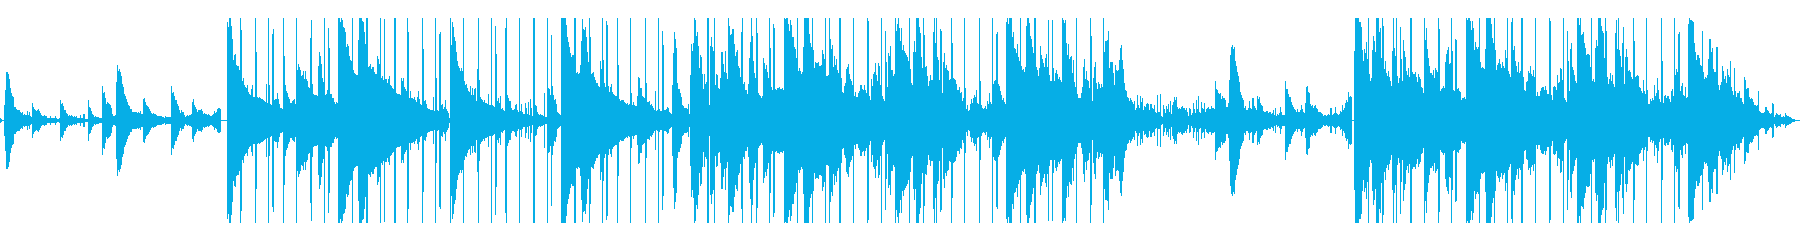 Lofi Hiphop/チル/切ないの再生済みの波形